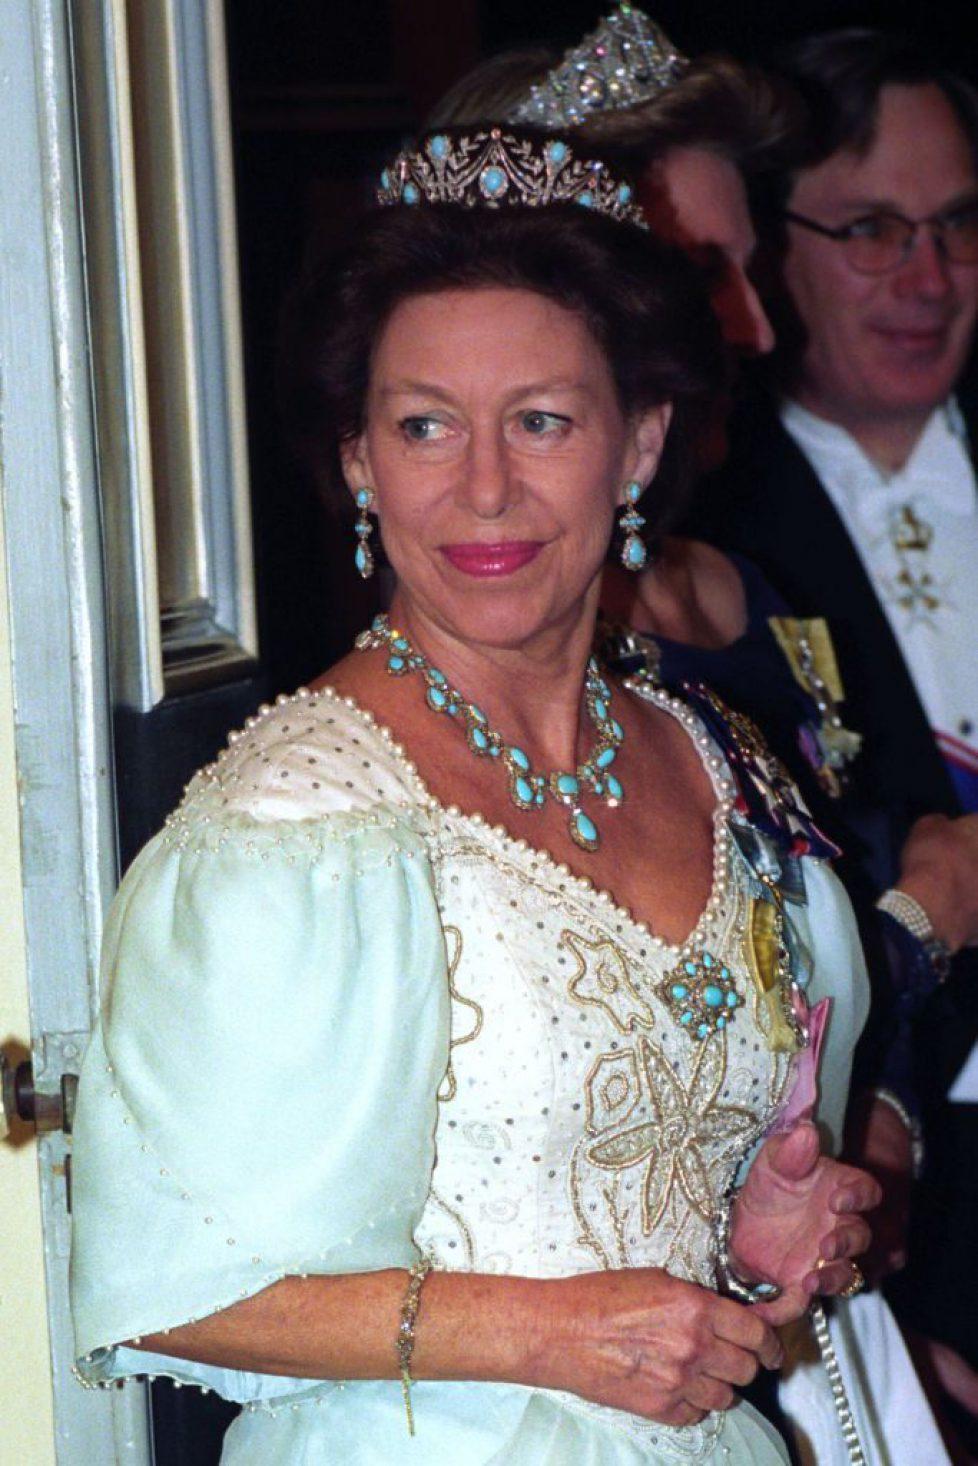 princess-margaret-before-entering-the-banqueting-room-at-news-photo-829797812-1541453914